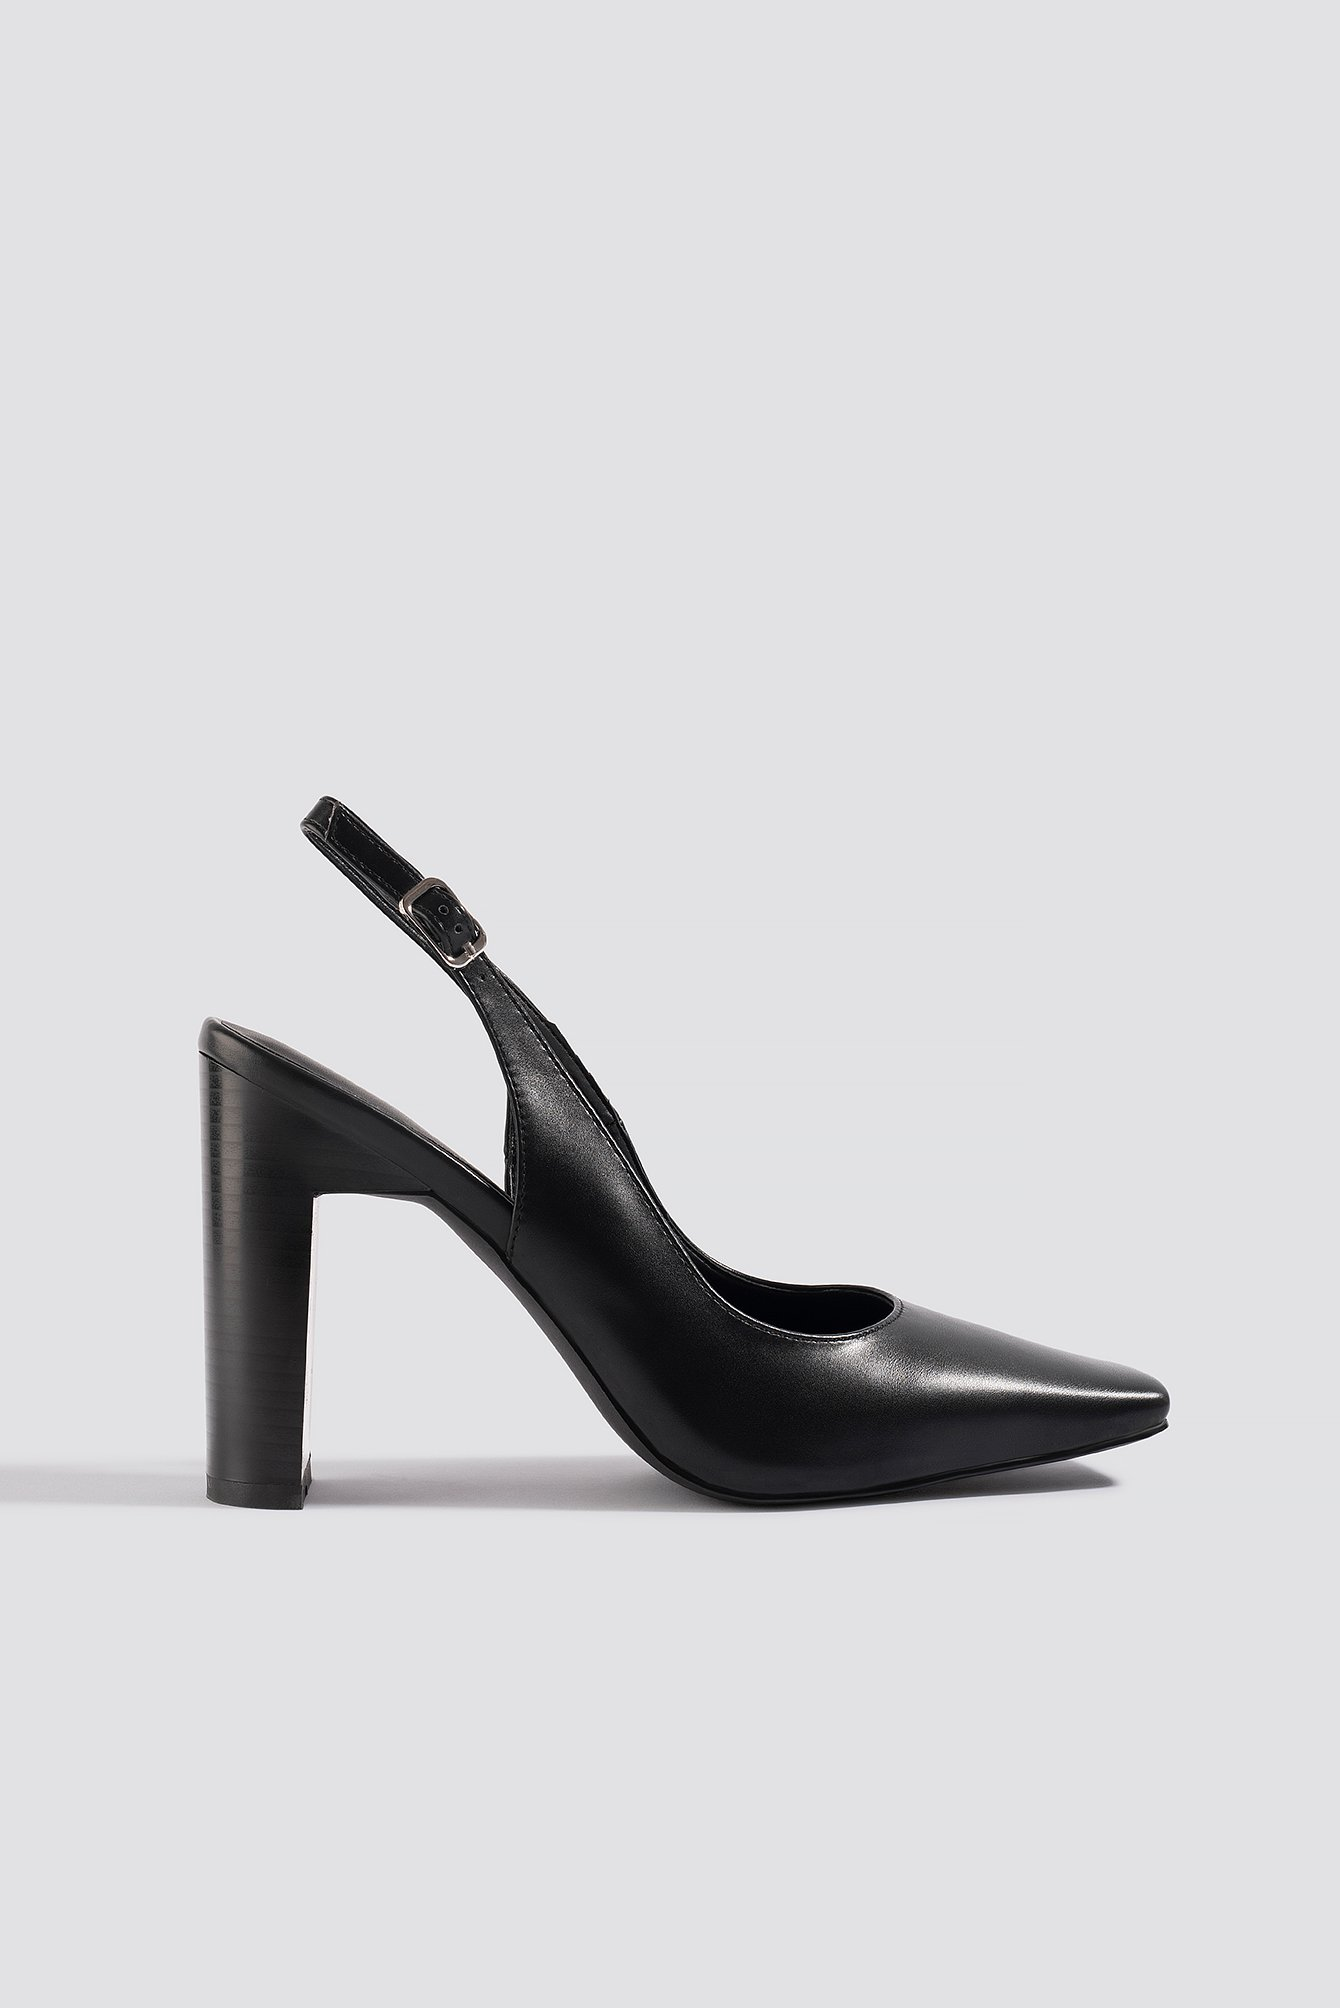 na-kd shoes -  Squared Front Slingback Pumps - Black